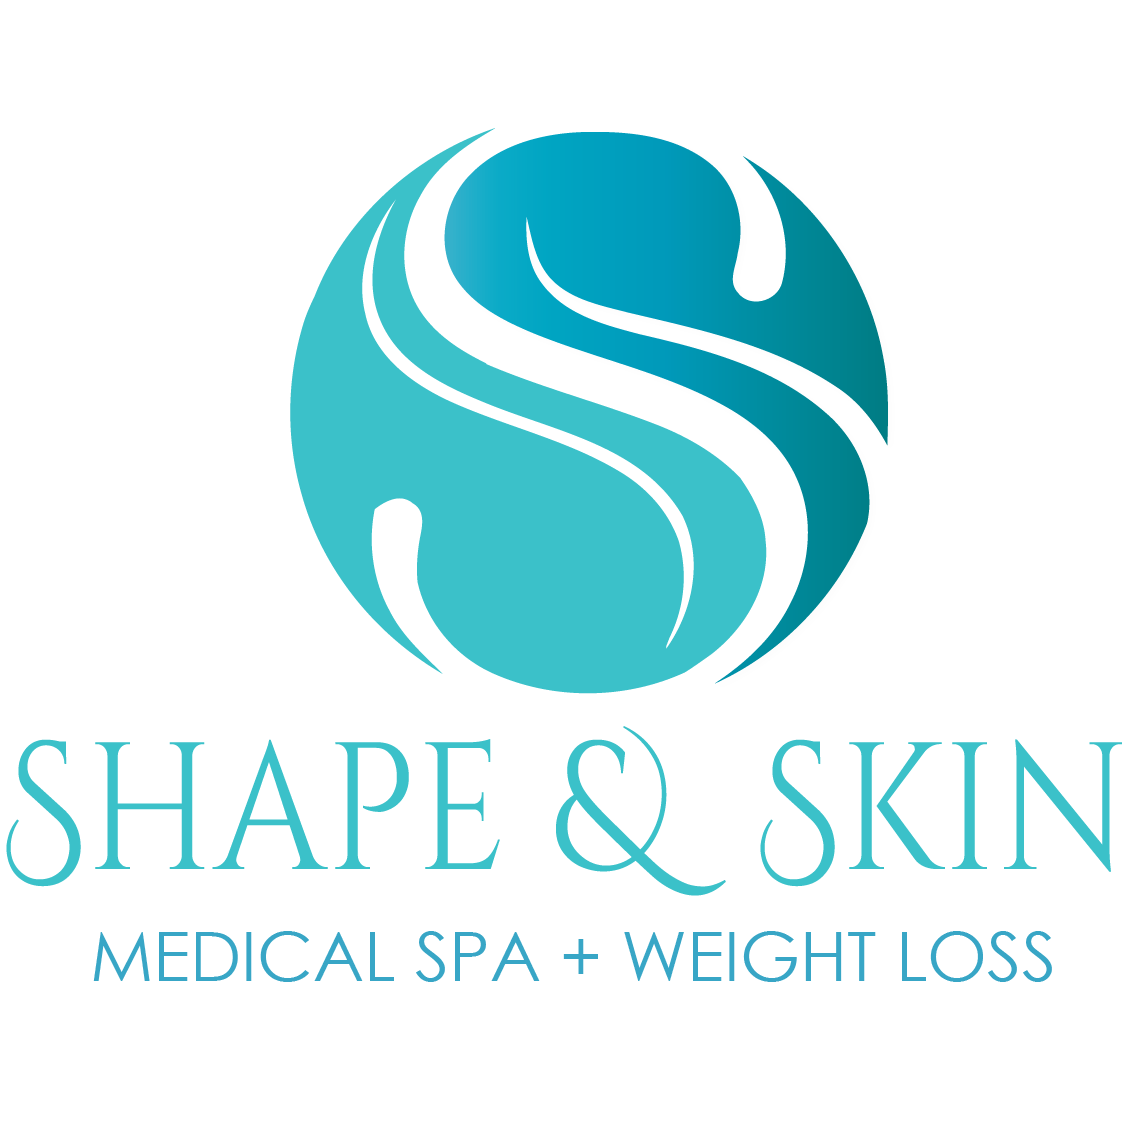 SHAPE & SKIN Medical Spa & Weight Loss